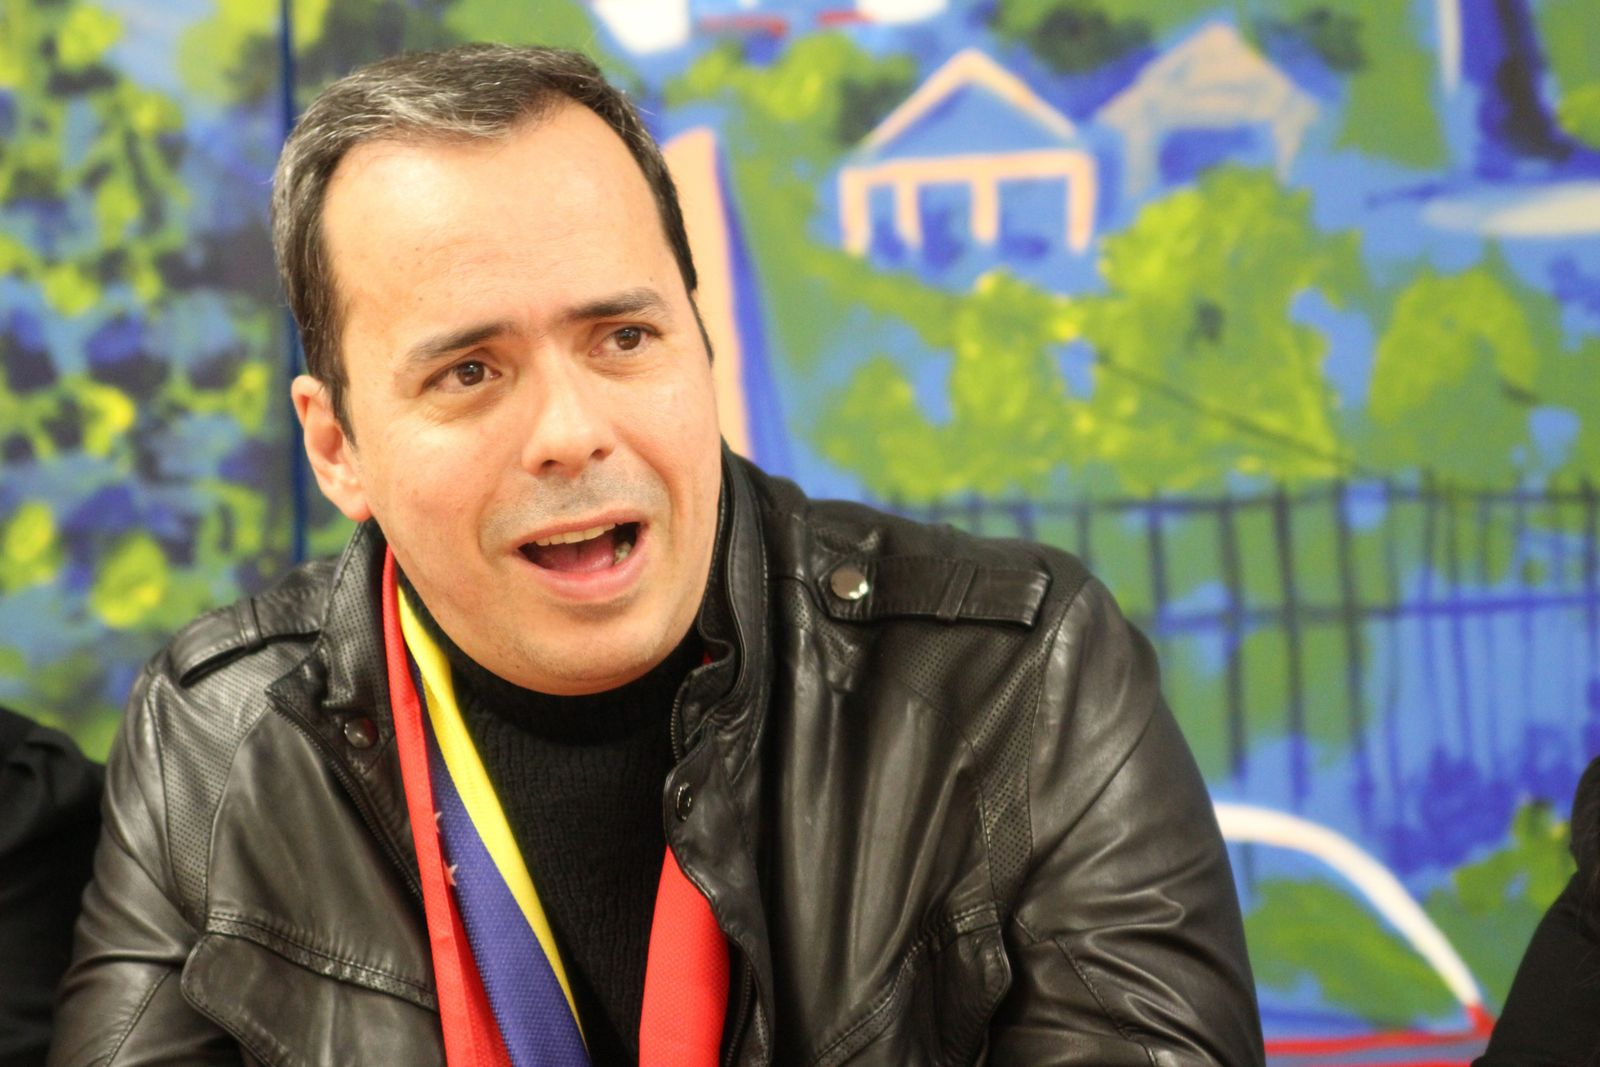 Guaido adviser admits signing contract for failed maritime raid in Venezuela, Houston, USA - 03 Nov 2013